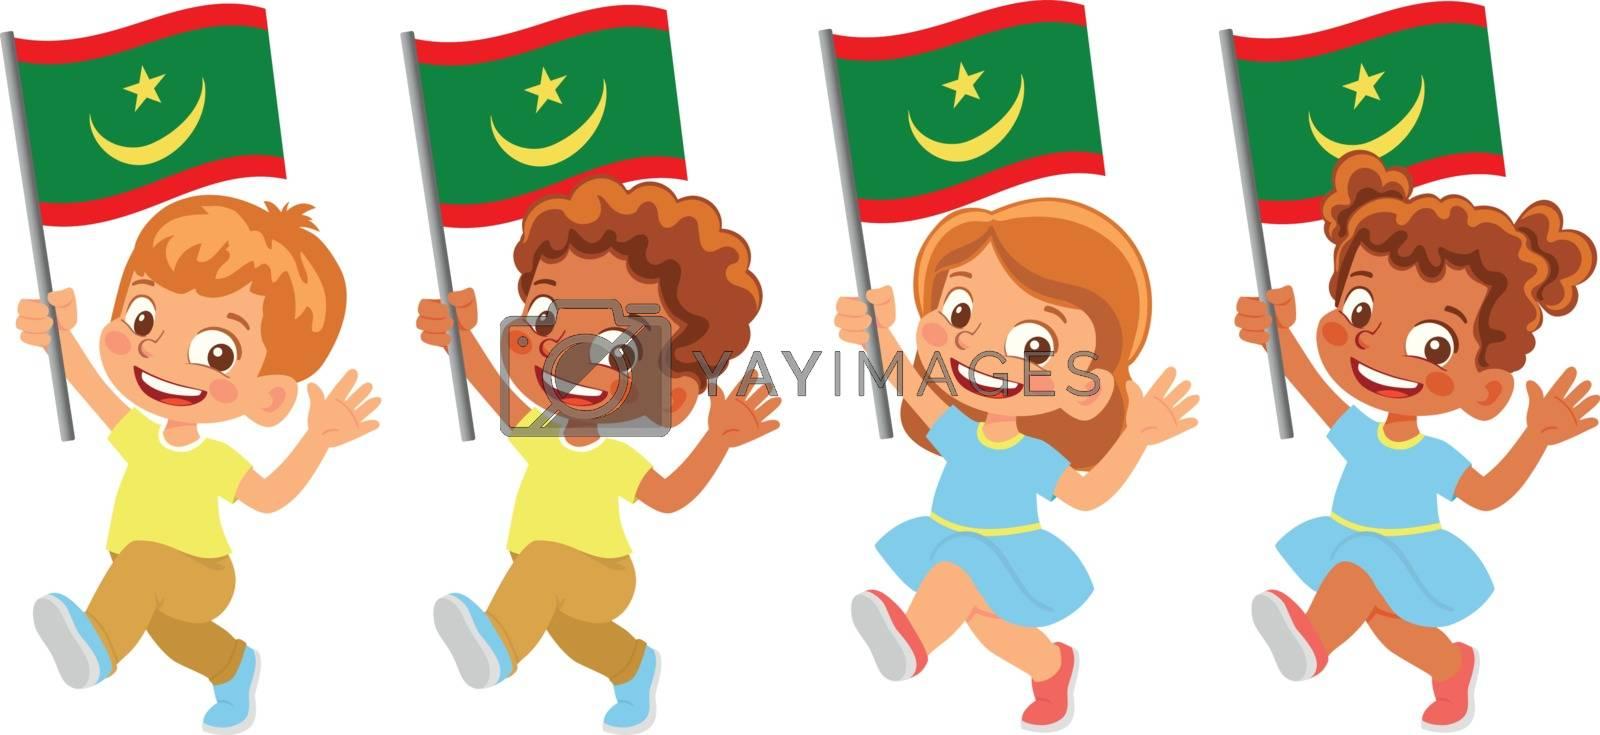 Mauritania flag in hand. Children holding flag. National flag of Mauritania vector